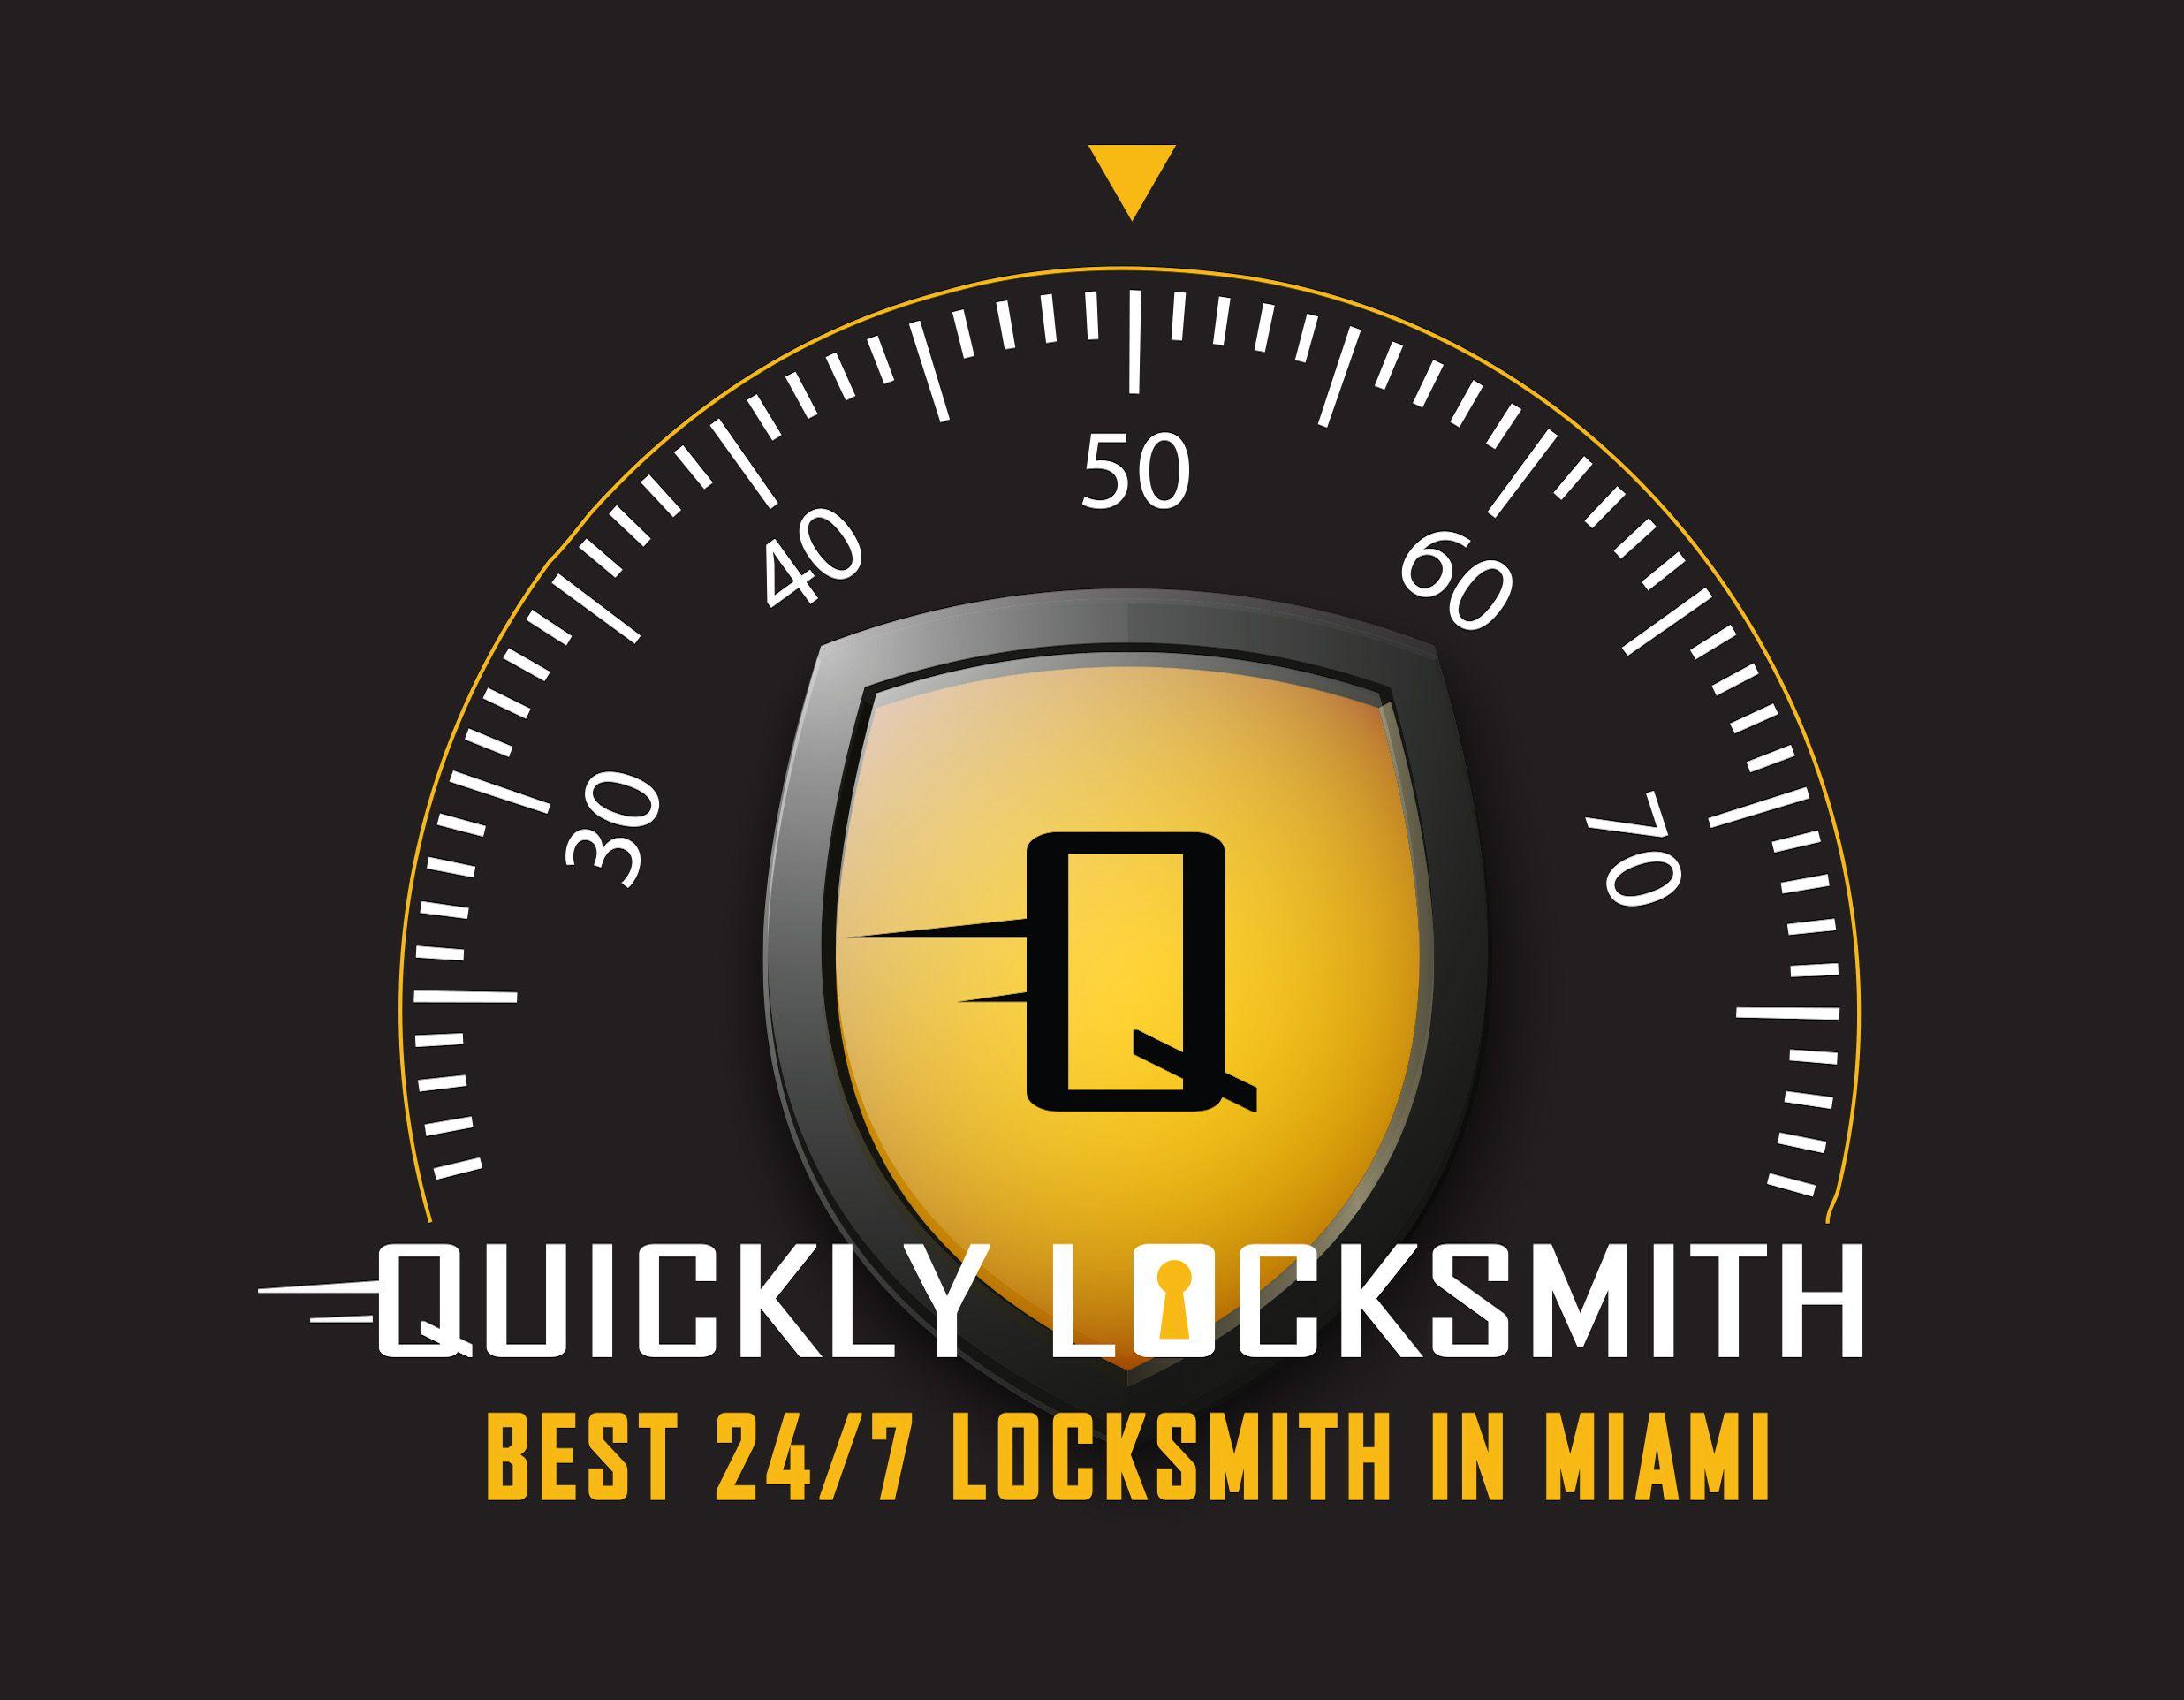 Quickly Locksmith Miami Logo Miami logo, Locksmith